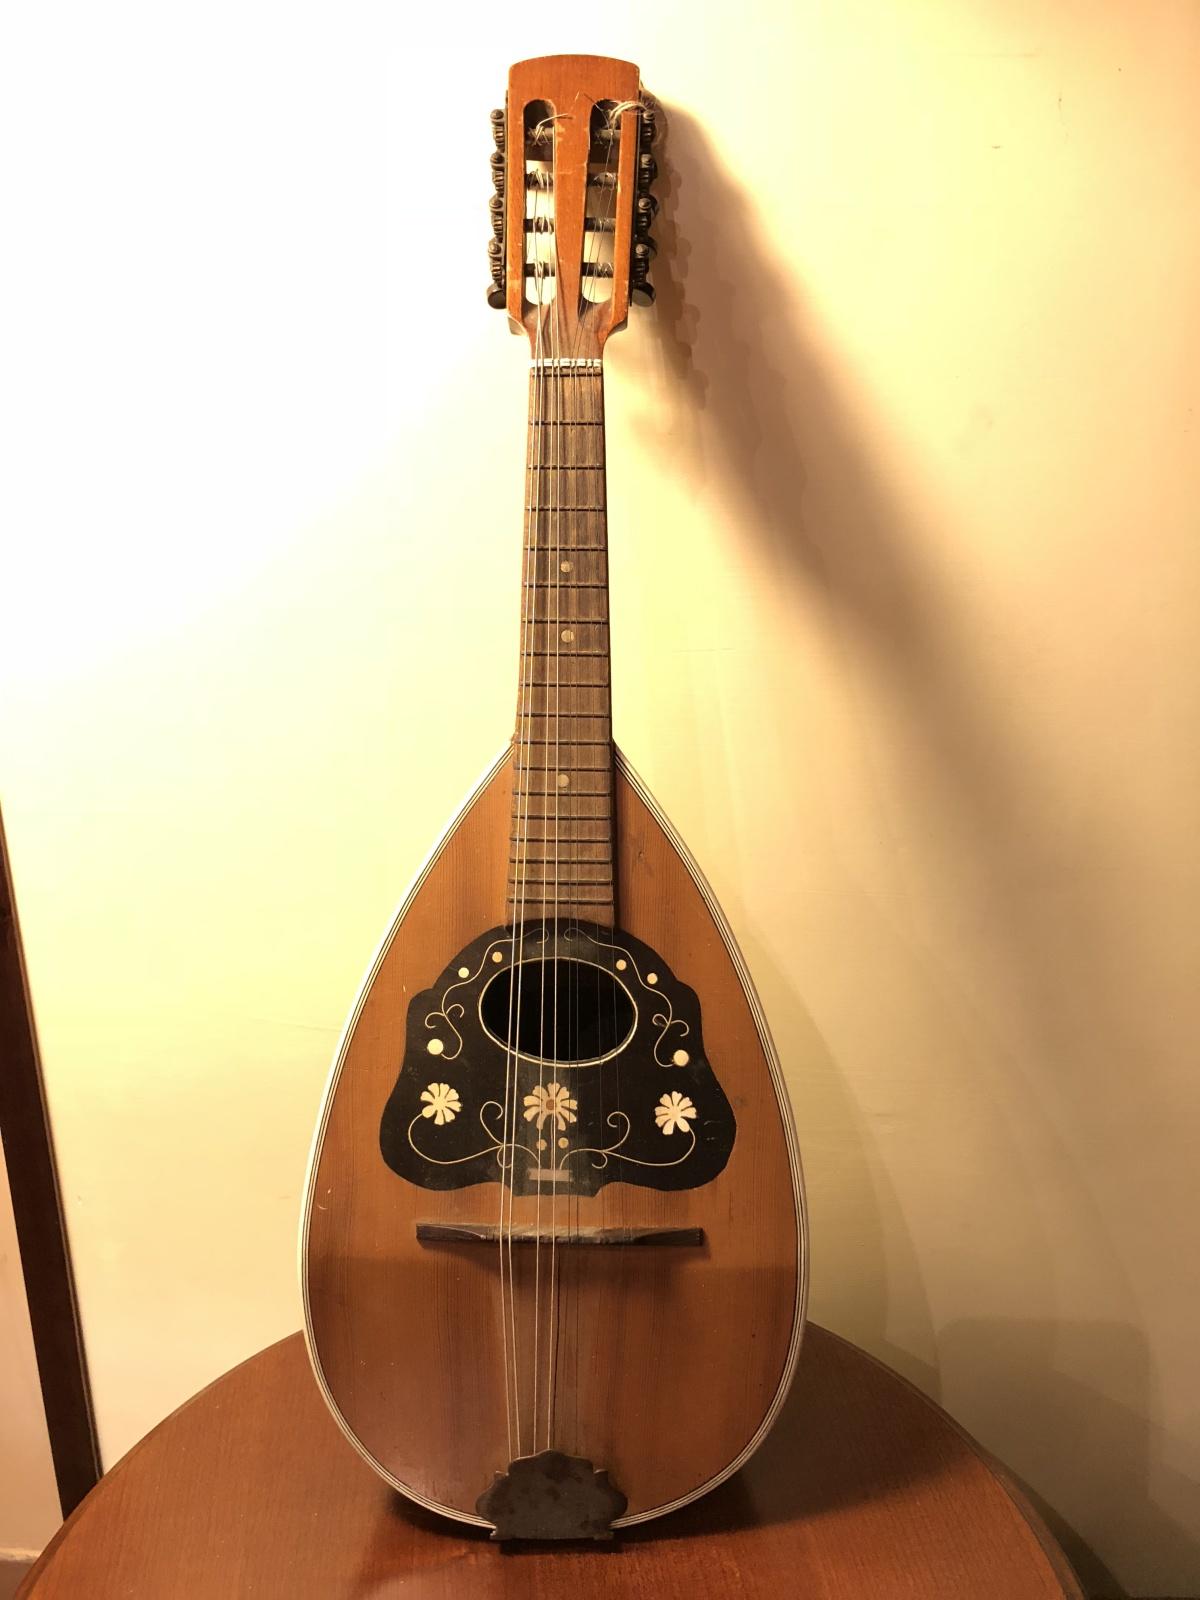 mandolino datazione Craigslist Maryland incontri